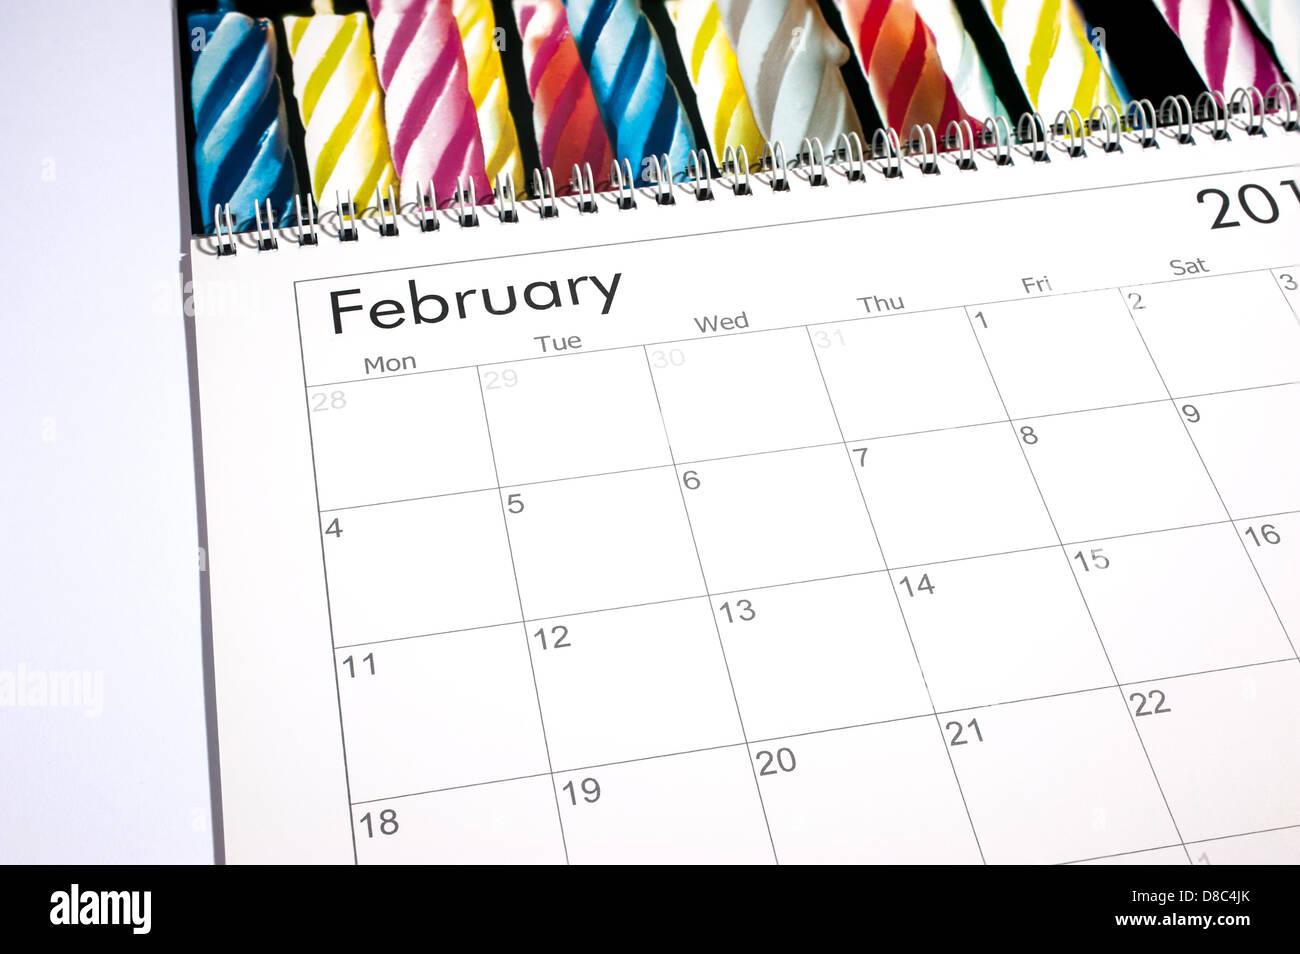 Blank calendar page - February 2013 - Stock Image